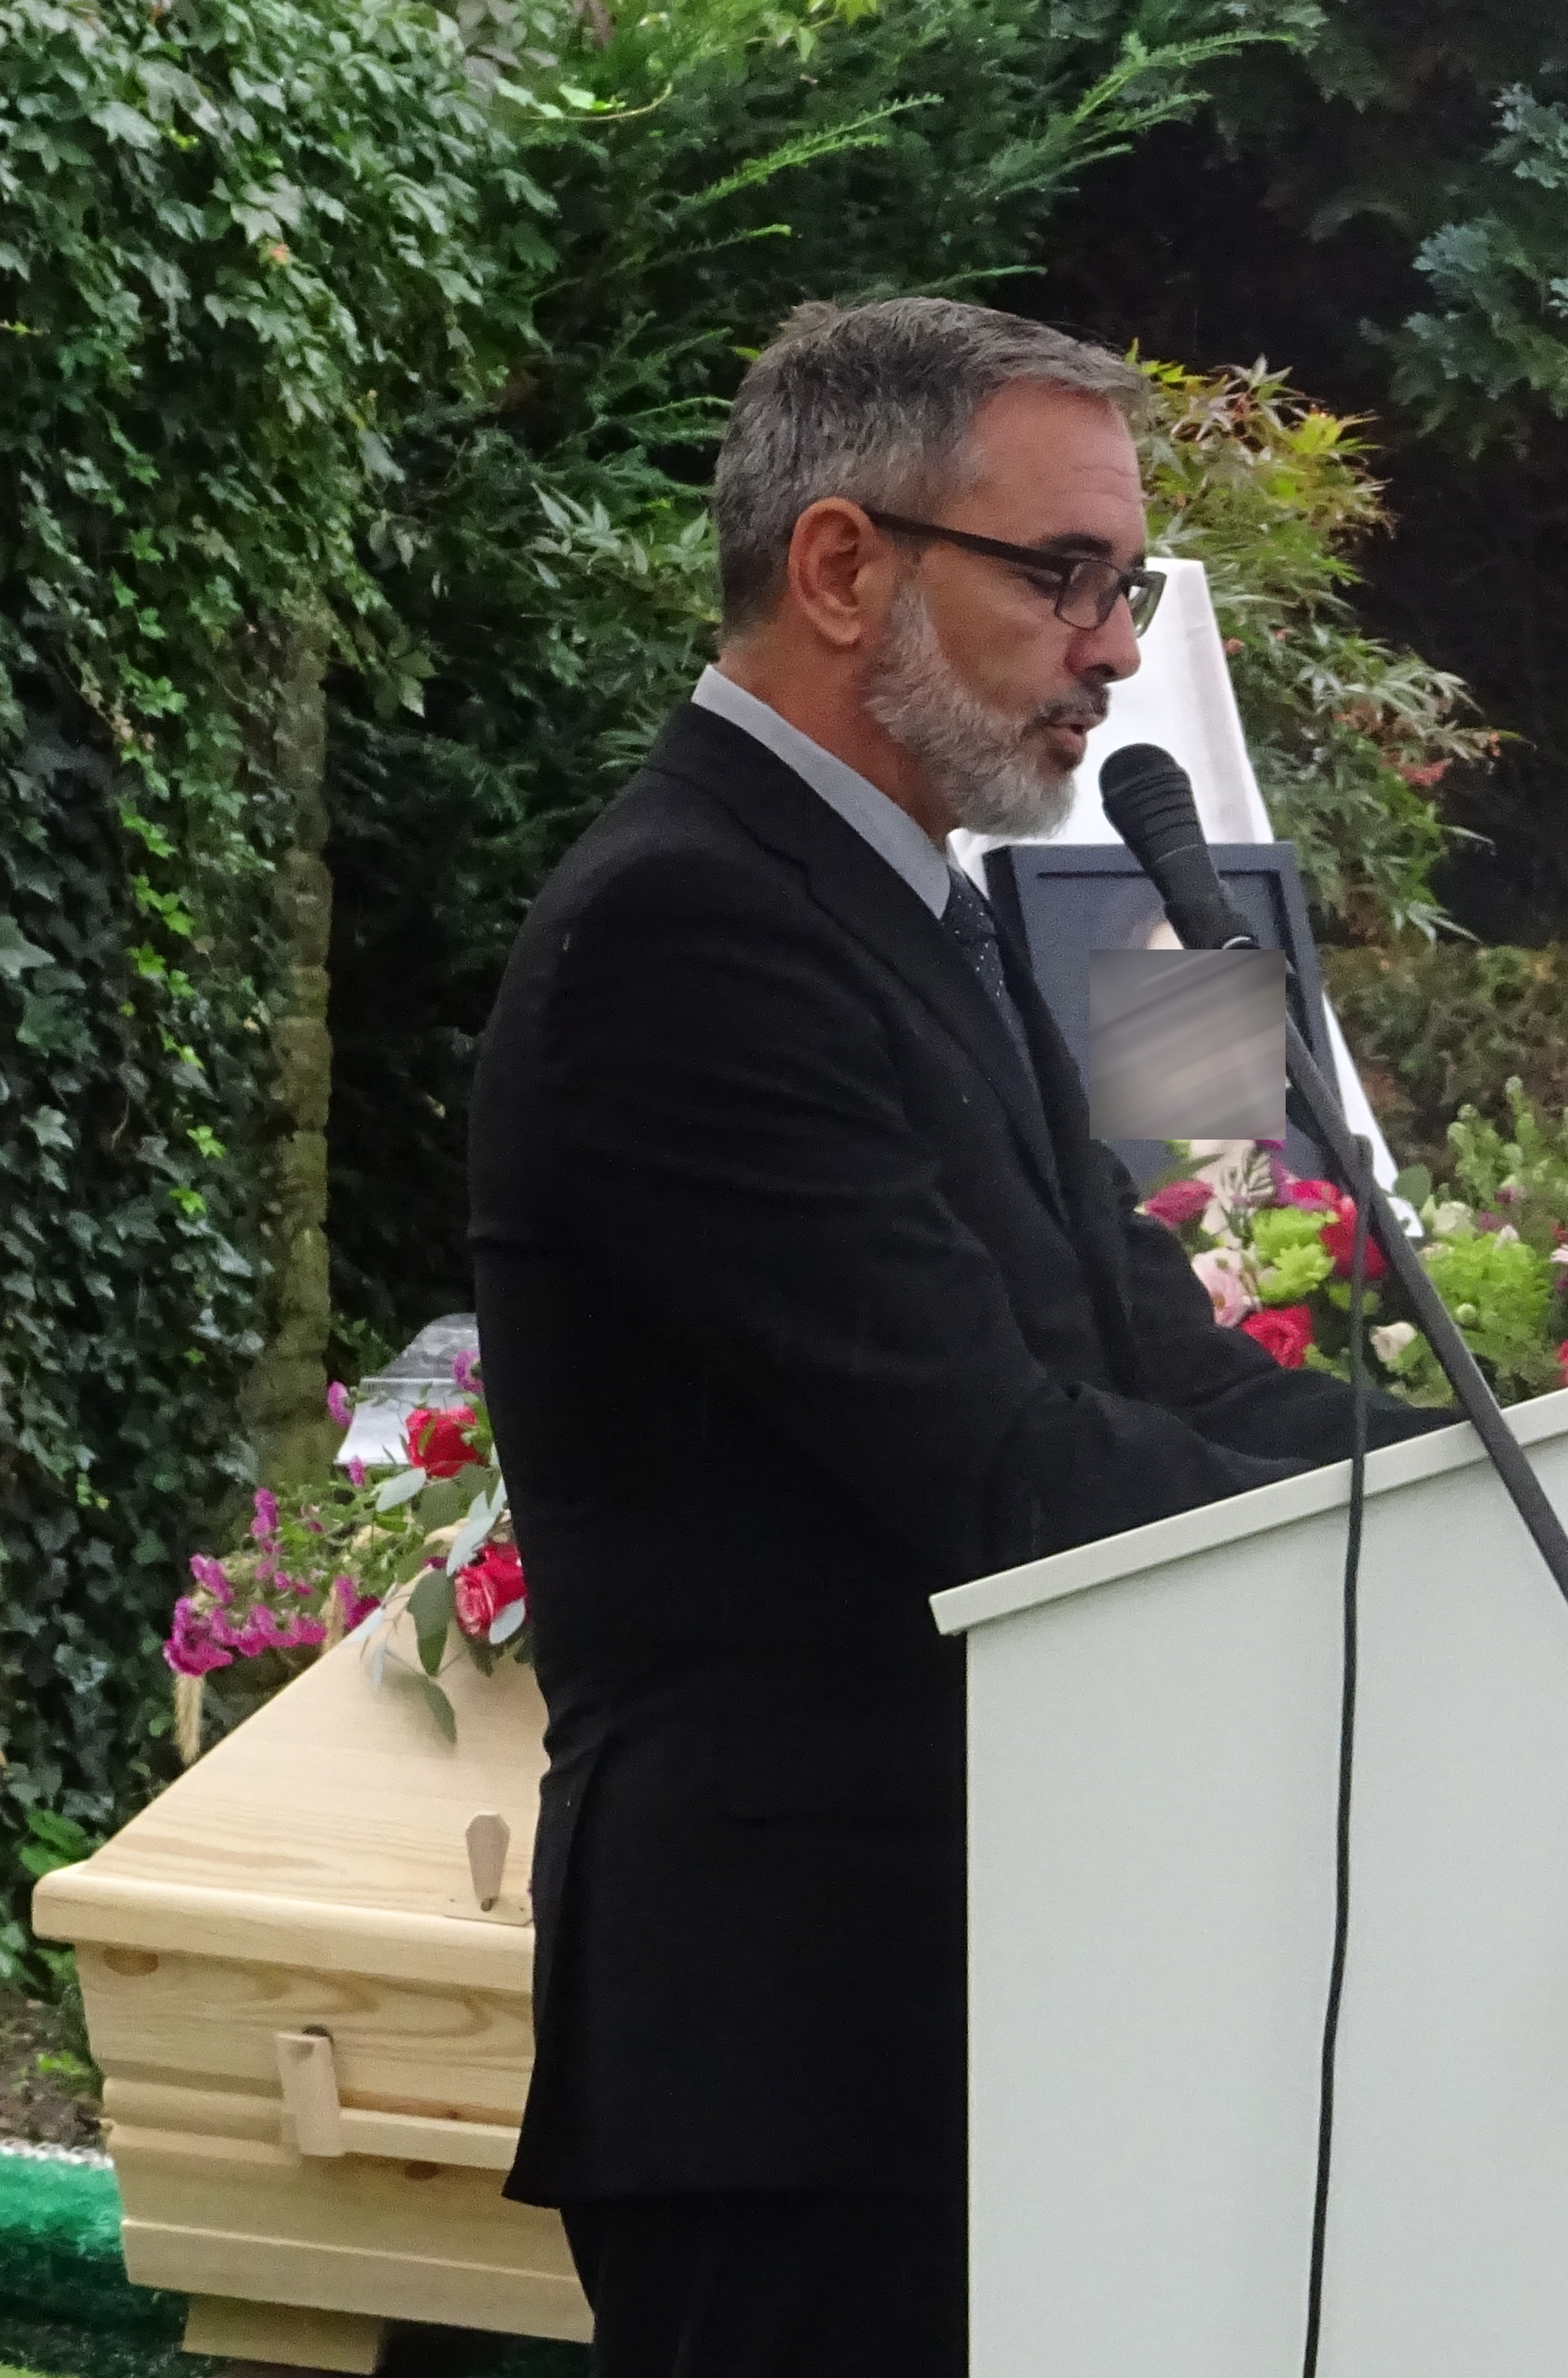 Trauerredner Grabredner Mario Dieringer.